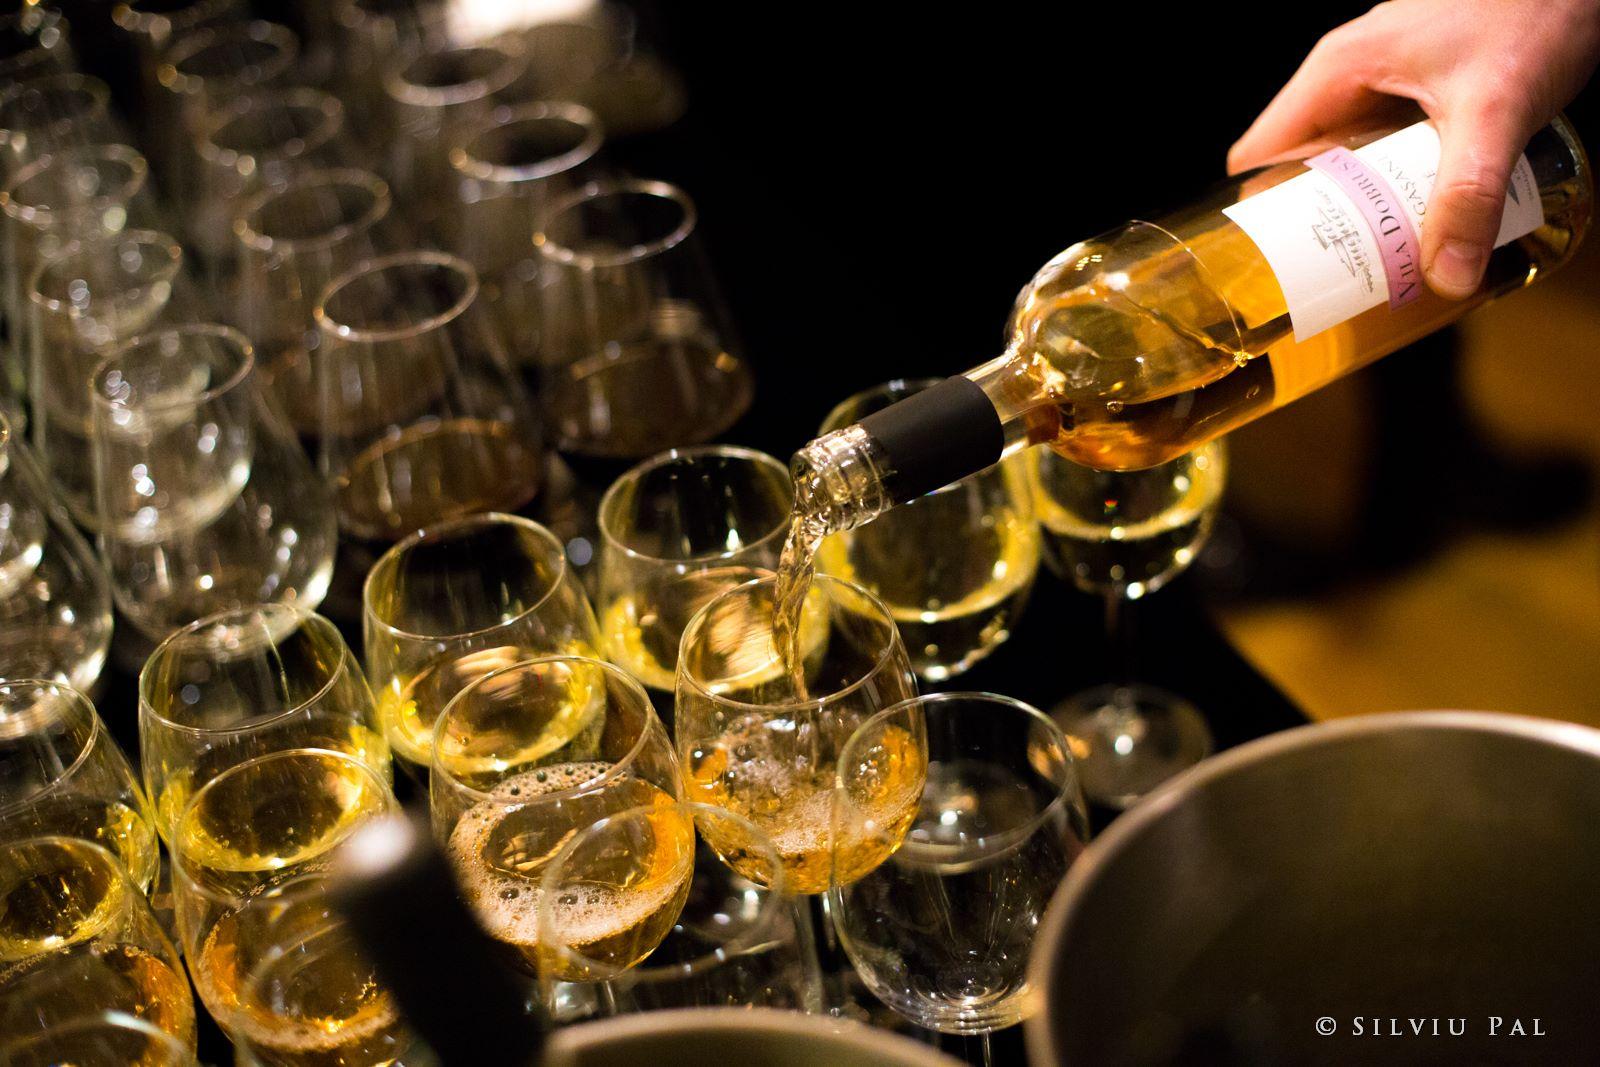 avincis, vila dobrusa, ranevents, ranevents comm, vin, victorian rose, romania, crama, pahare, rose, vin rosu, vin alb, cel mai bun vin, silviu pal